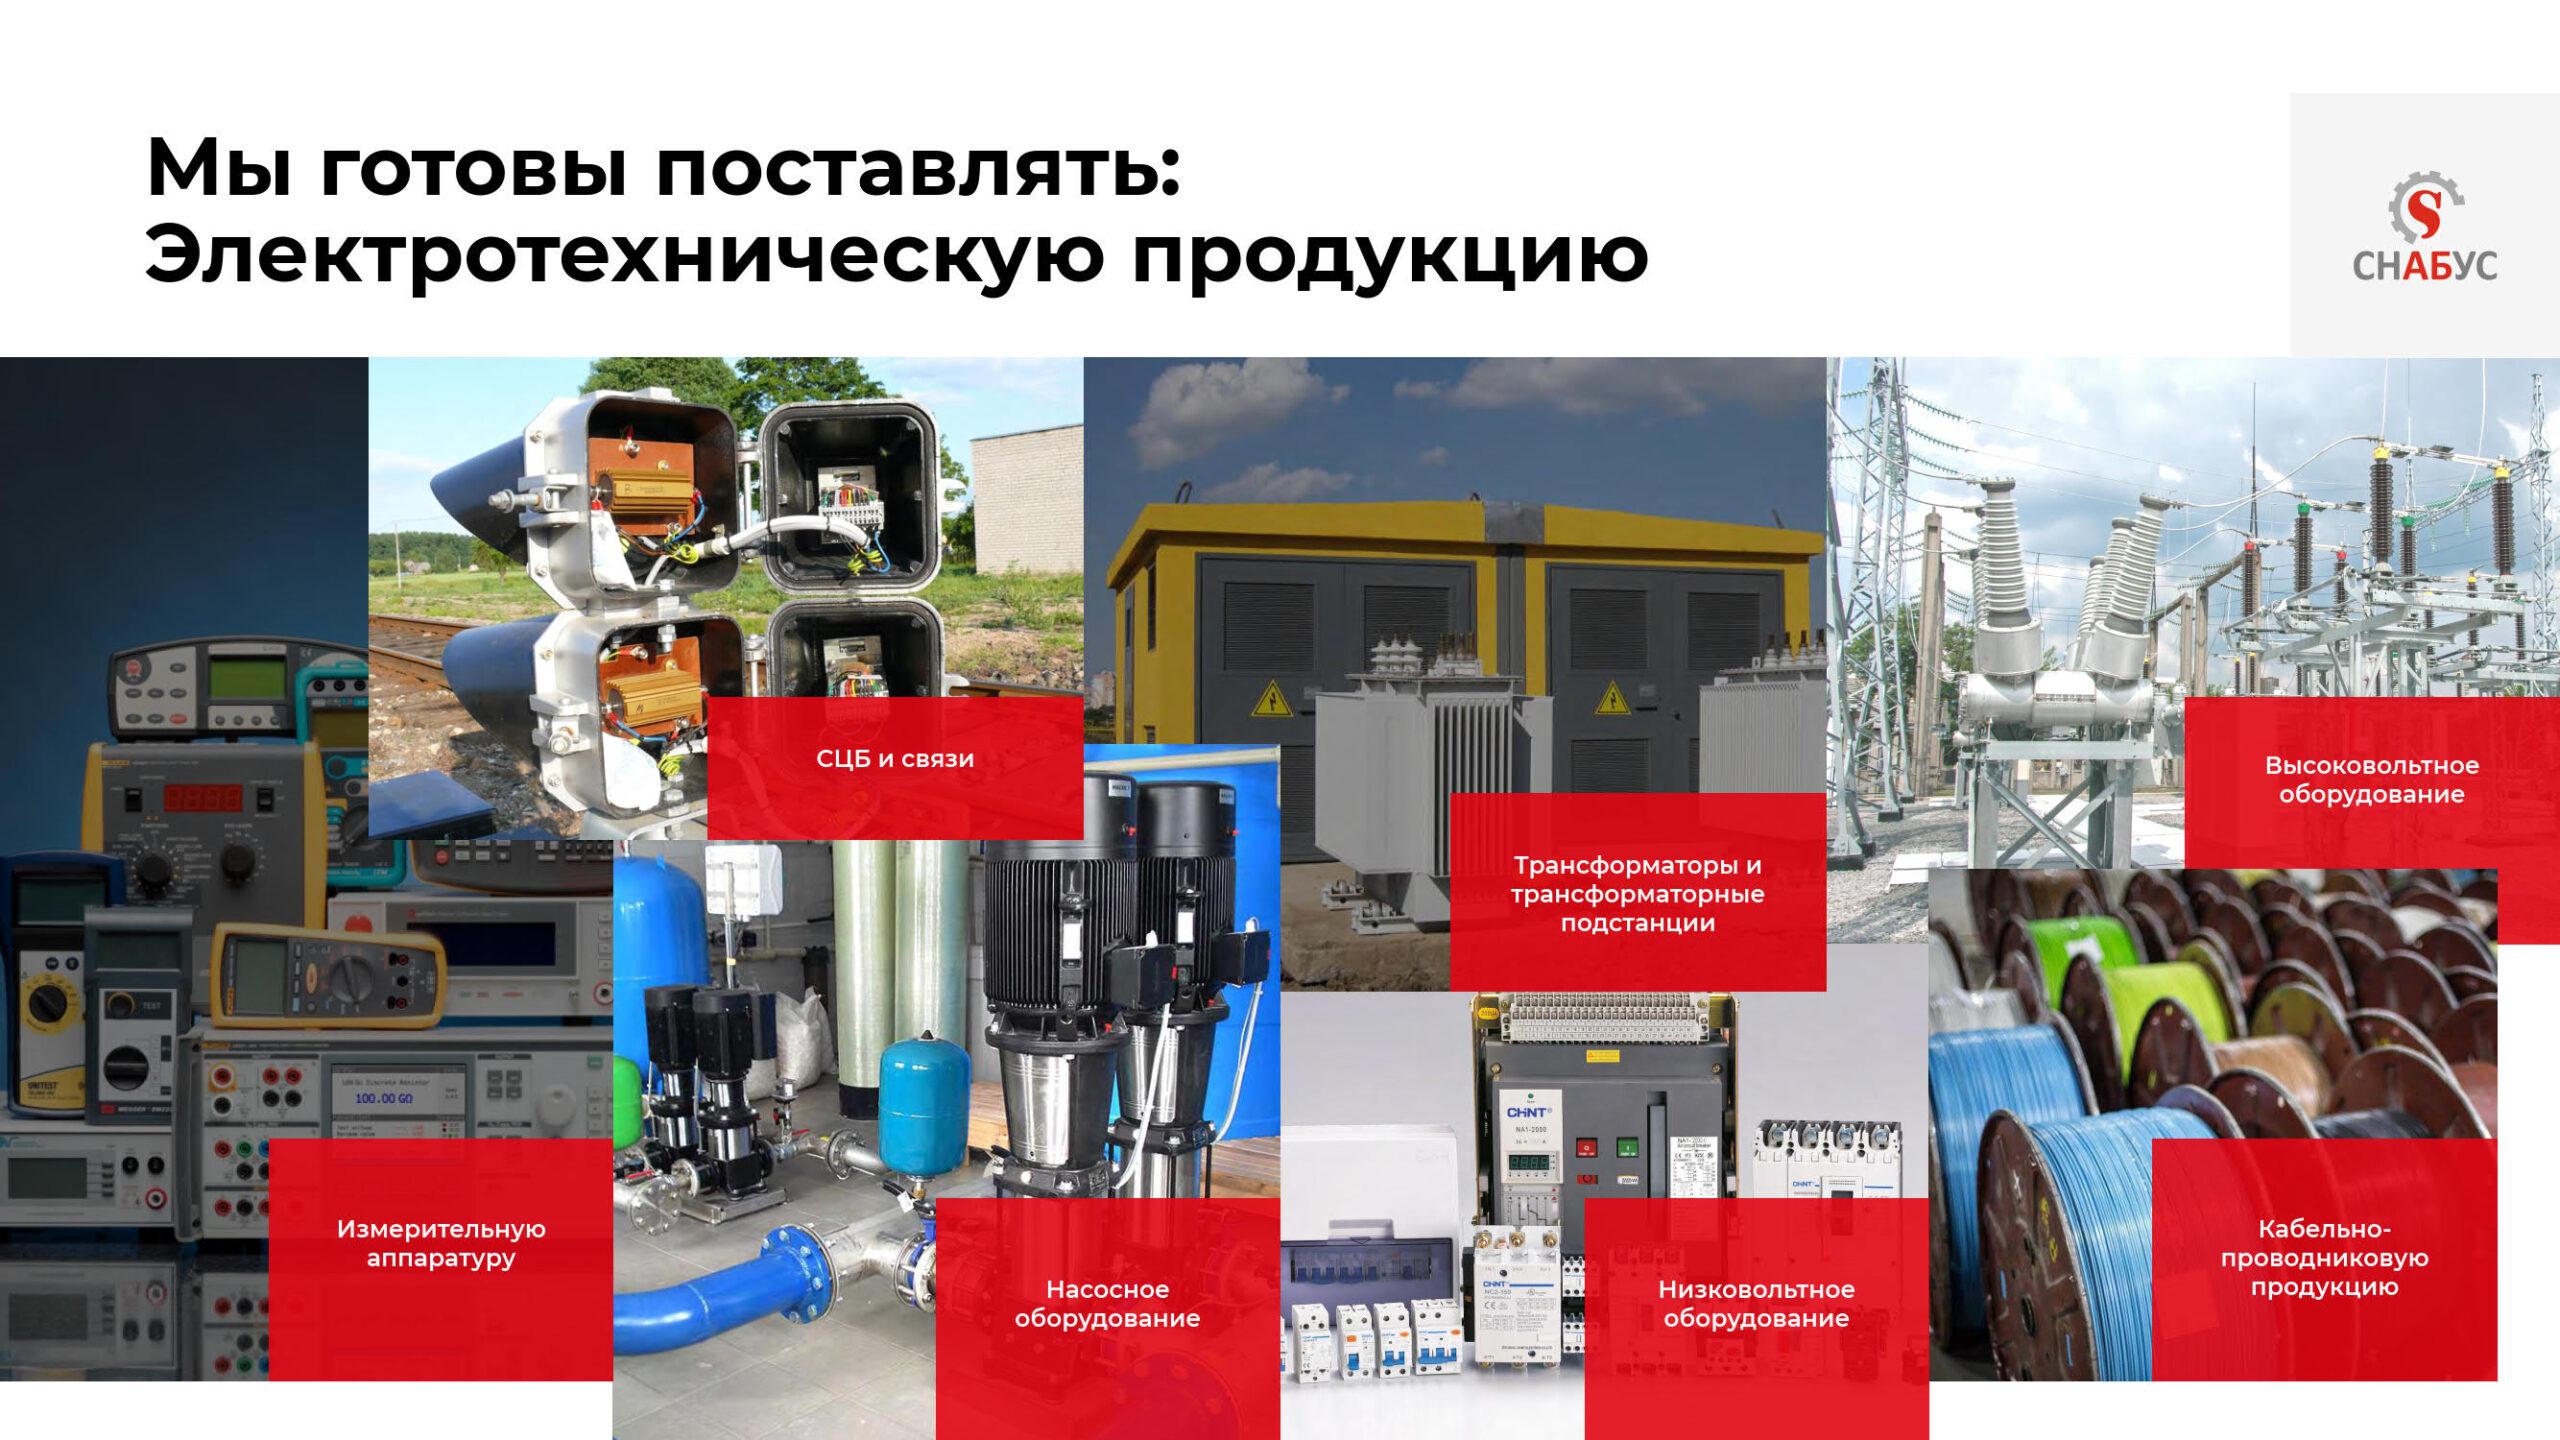 prezentacziya-optovoj-torgovoj-kompanii-postavka-jelektrotehnicheskaja-produkcija